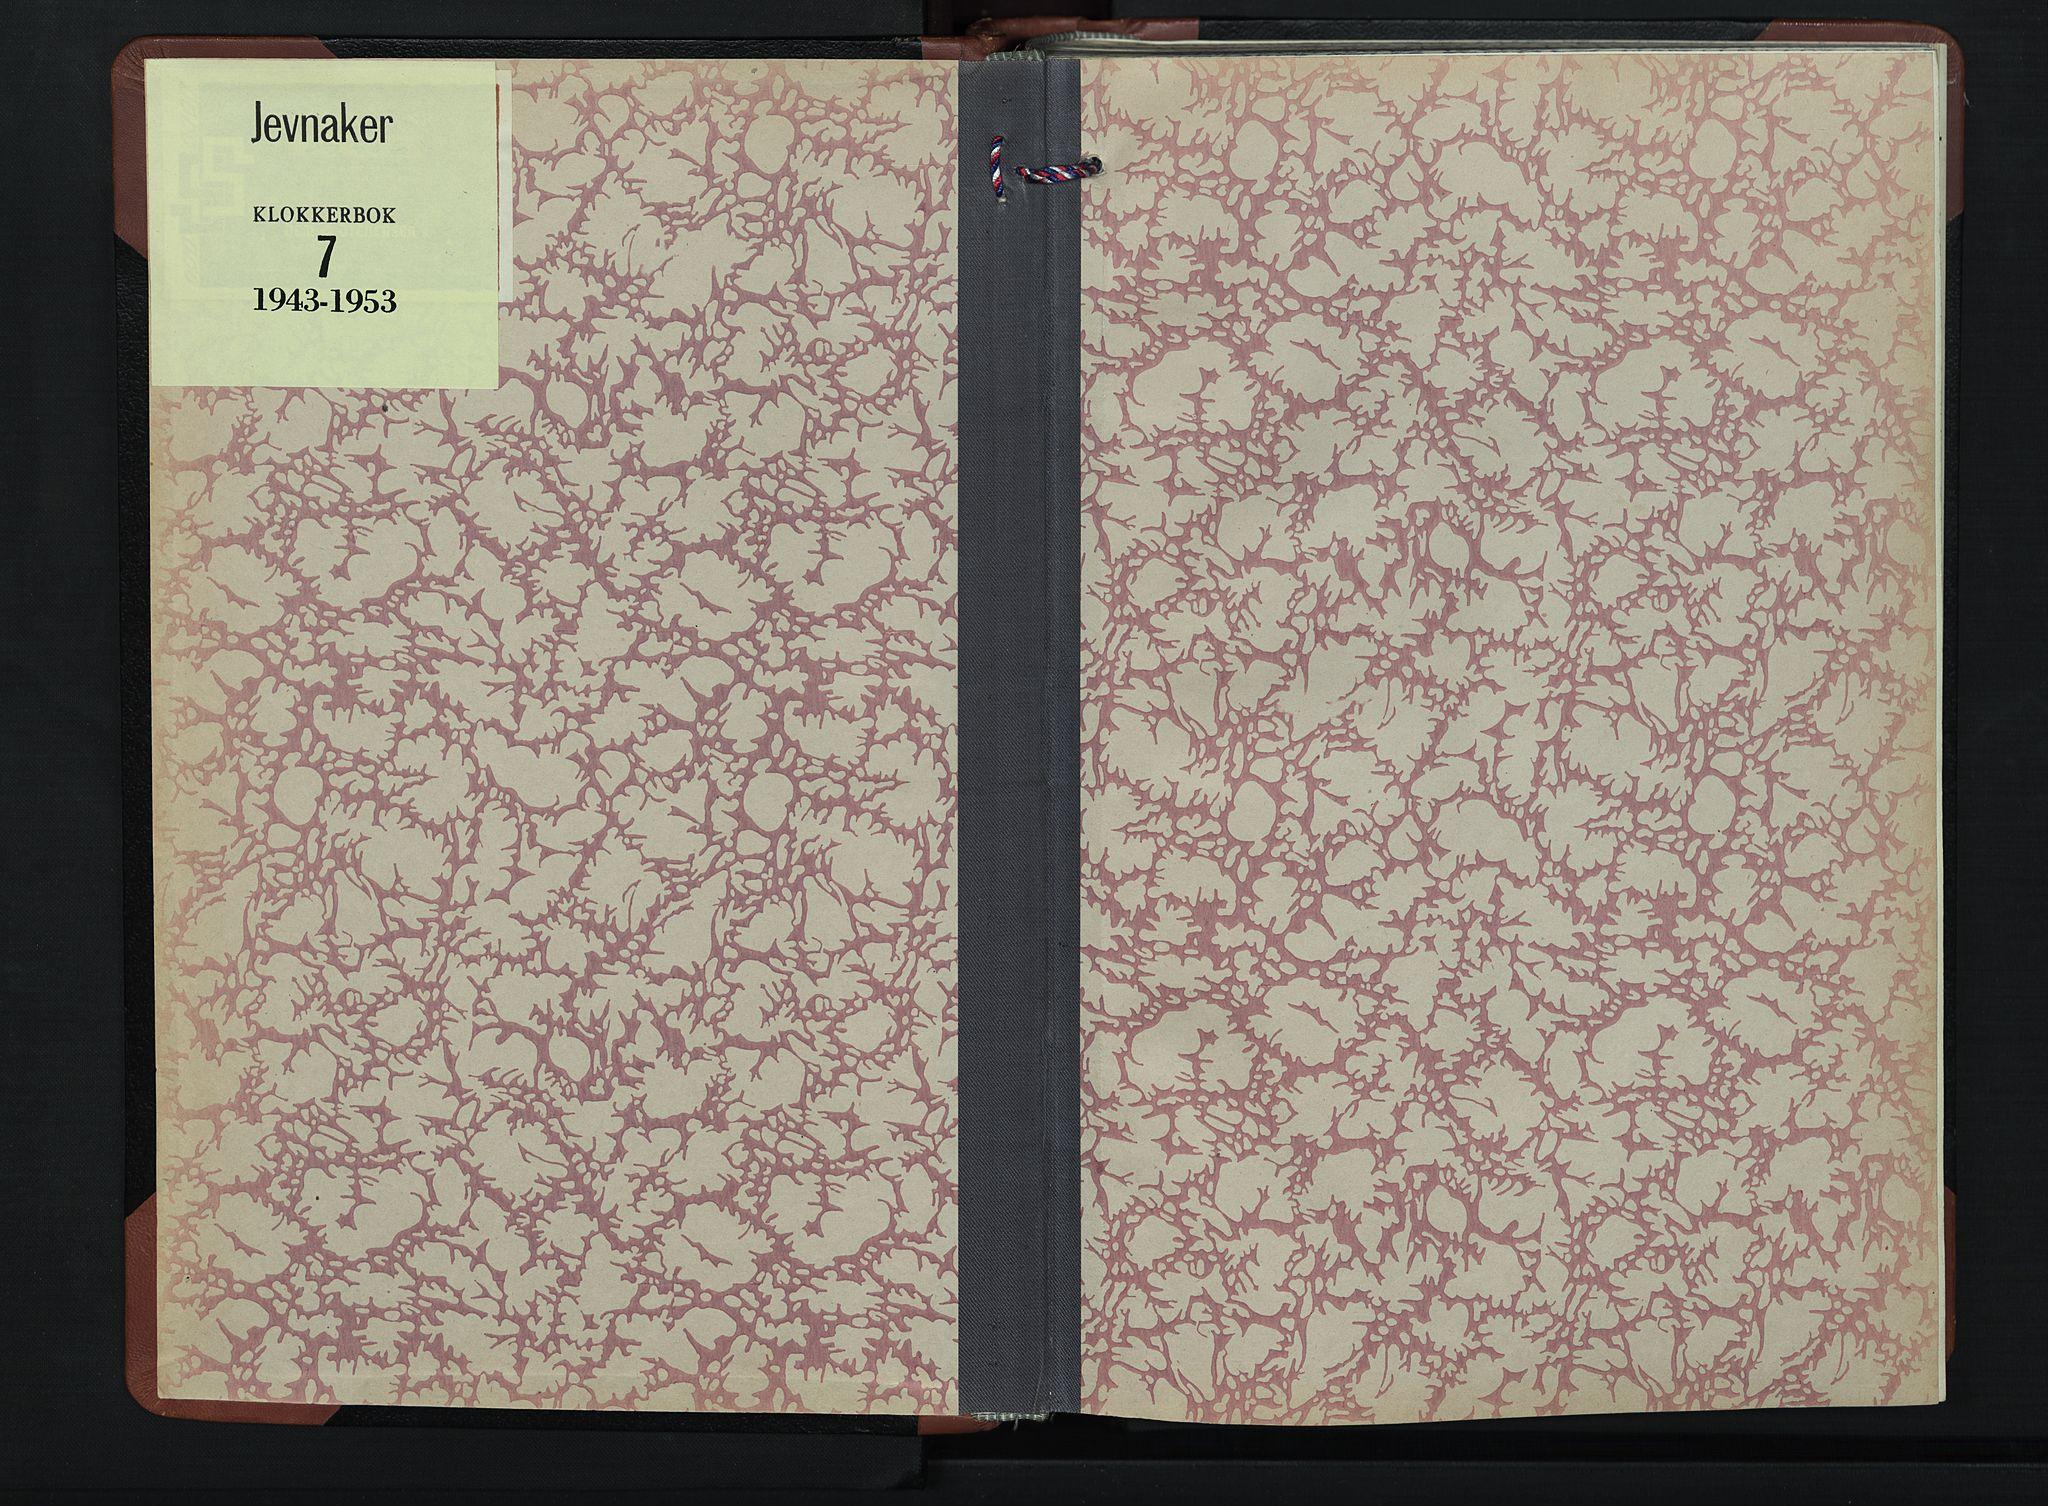 SAH, Jevnaker prestekontor, Klokkerbok nr. 7, 1943-1953